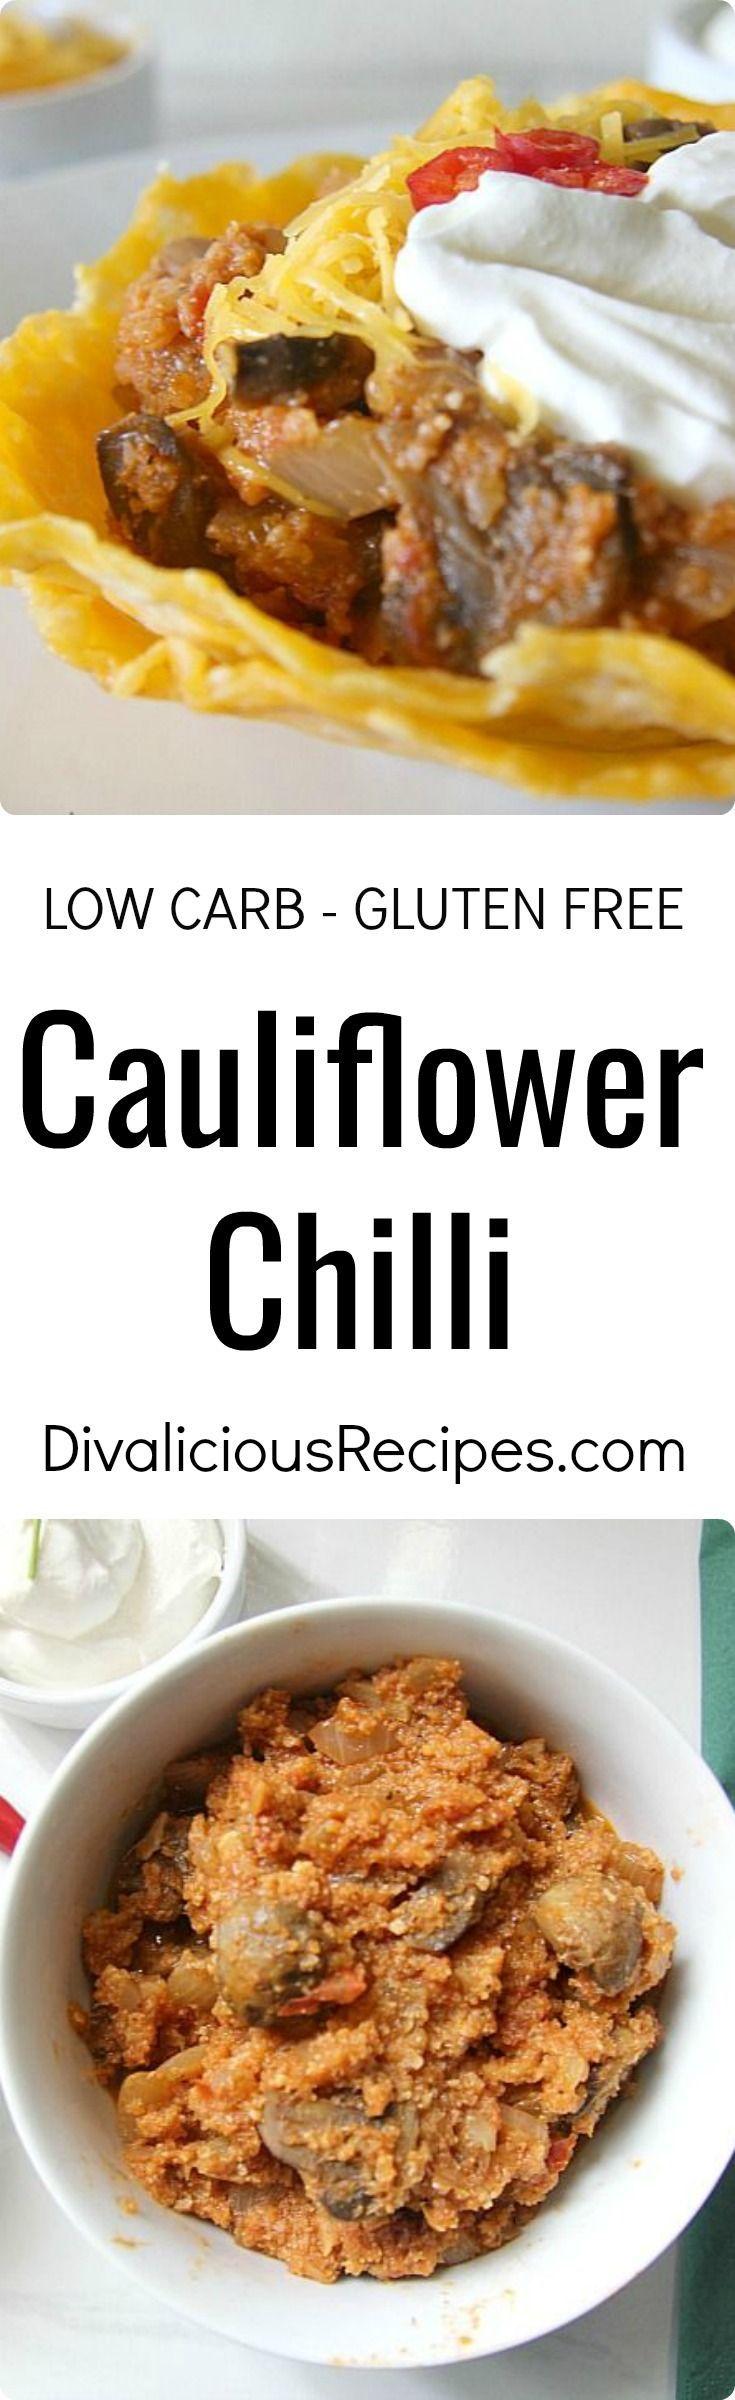 Cauliflower Chili Divalicious Recipes Recipe Delicious Vegetarian Vegetable Recipes Healthy Cooking